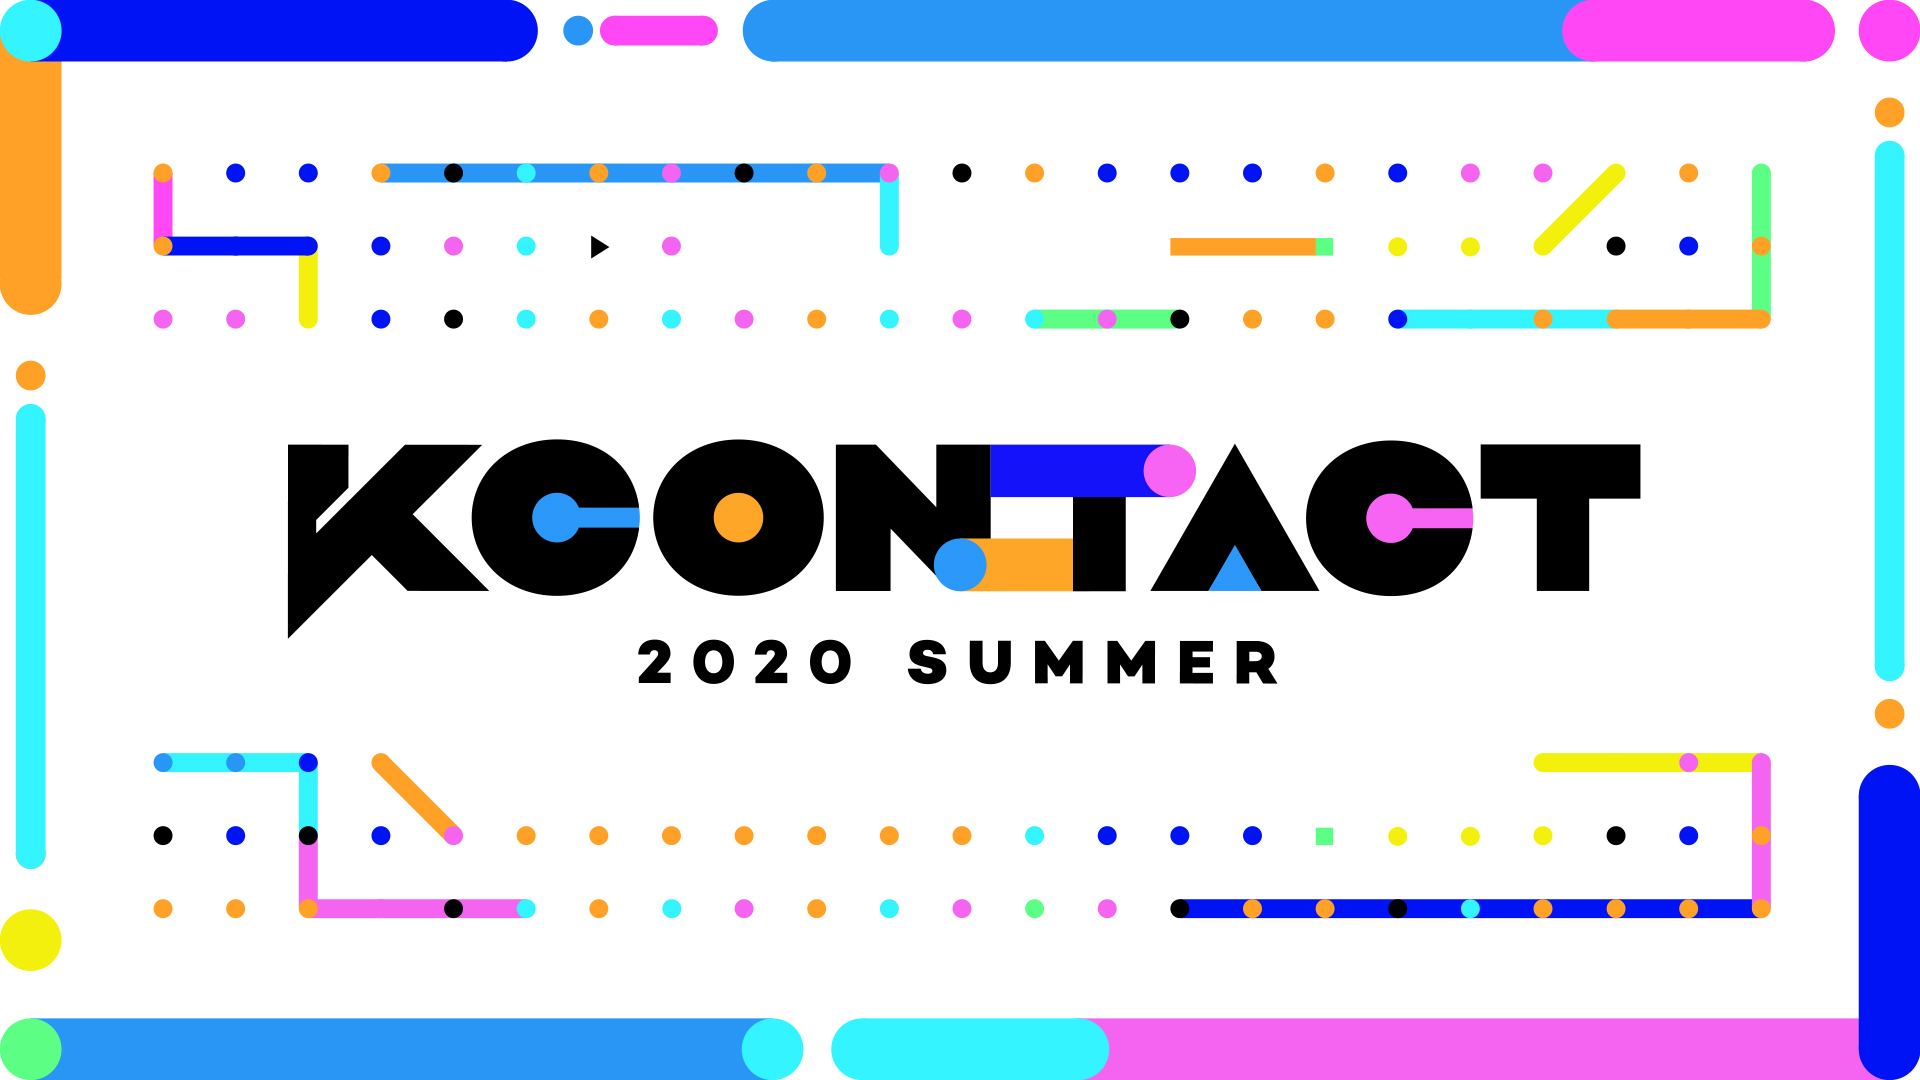 KCON:TACT 2020 SUMMER 字幕版